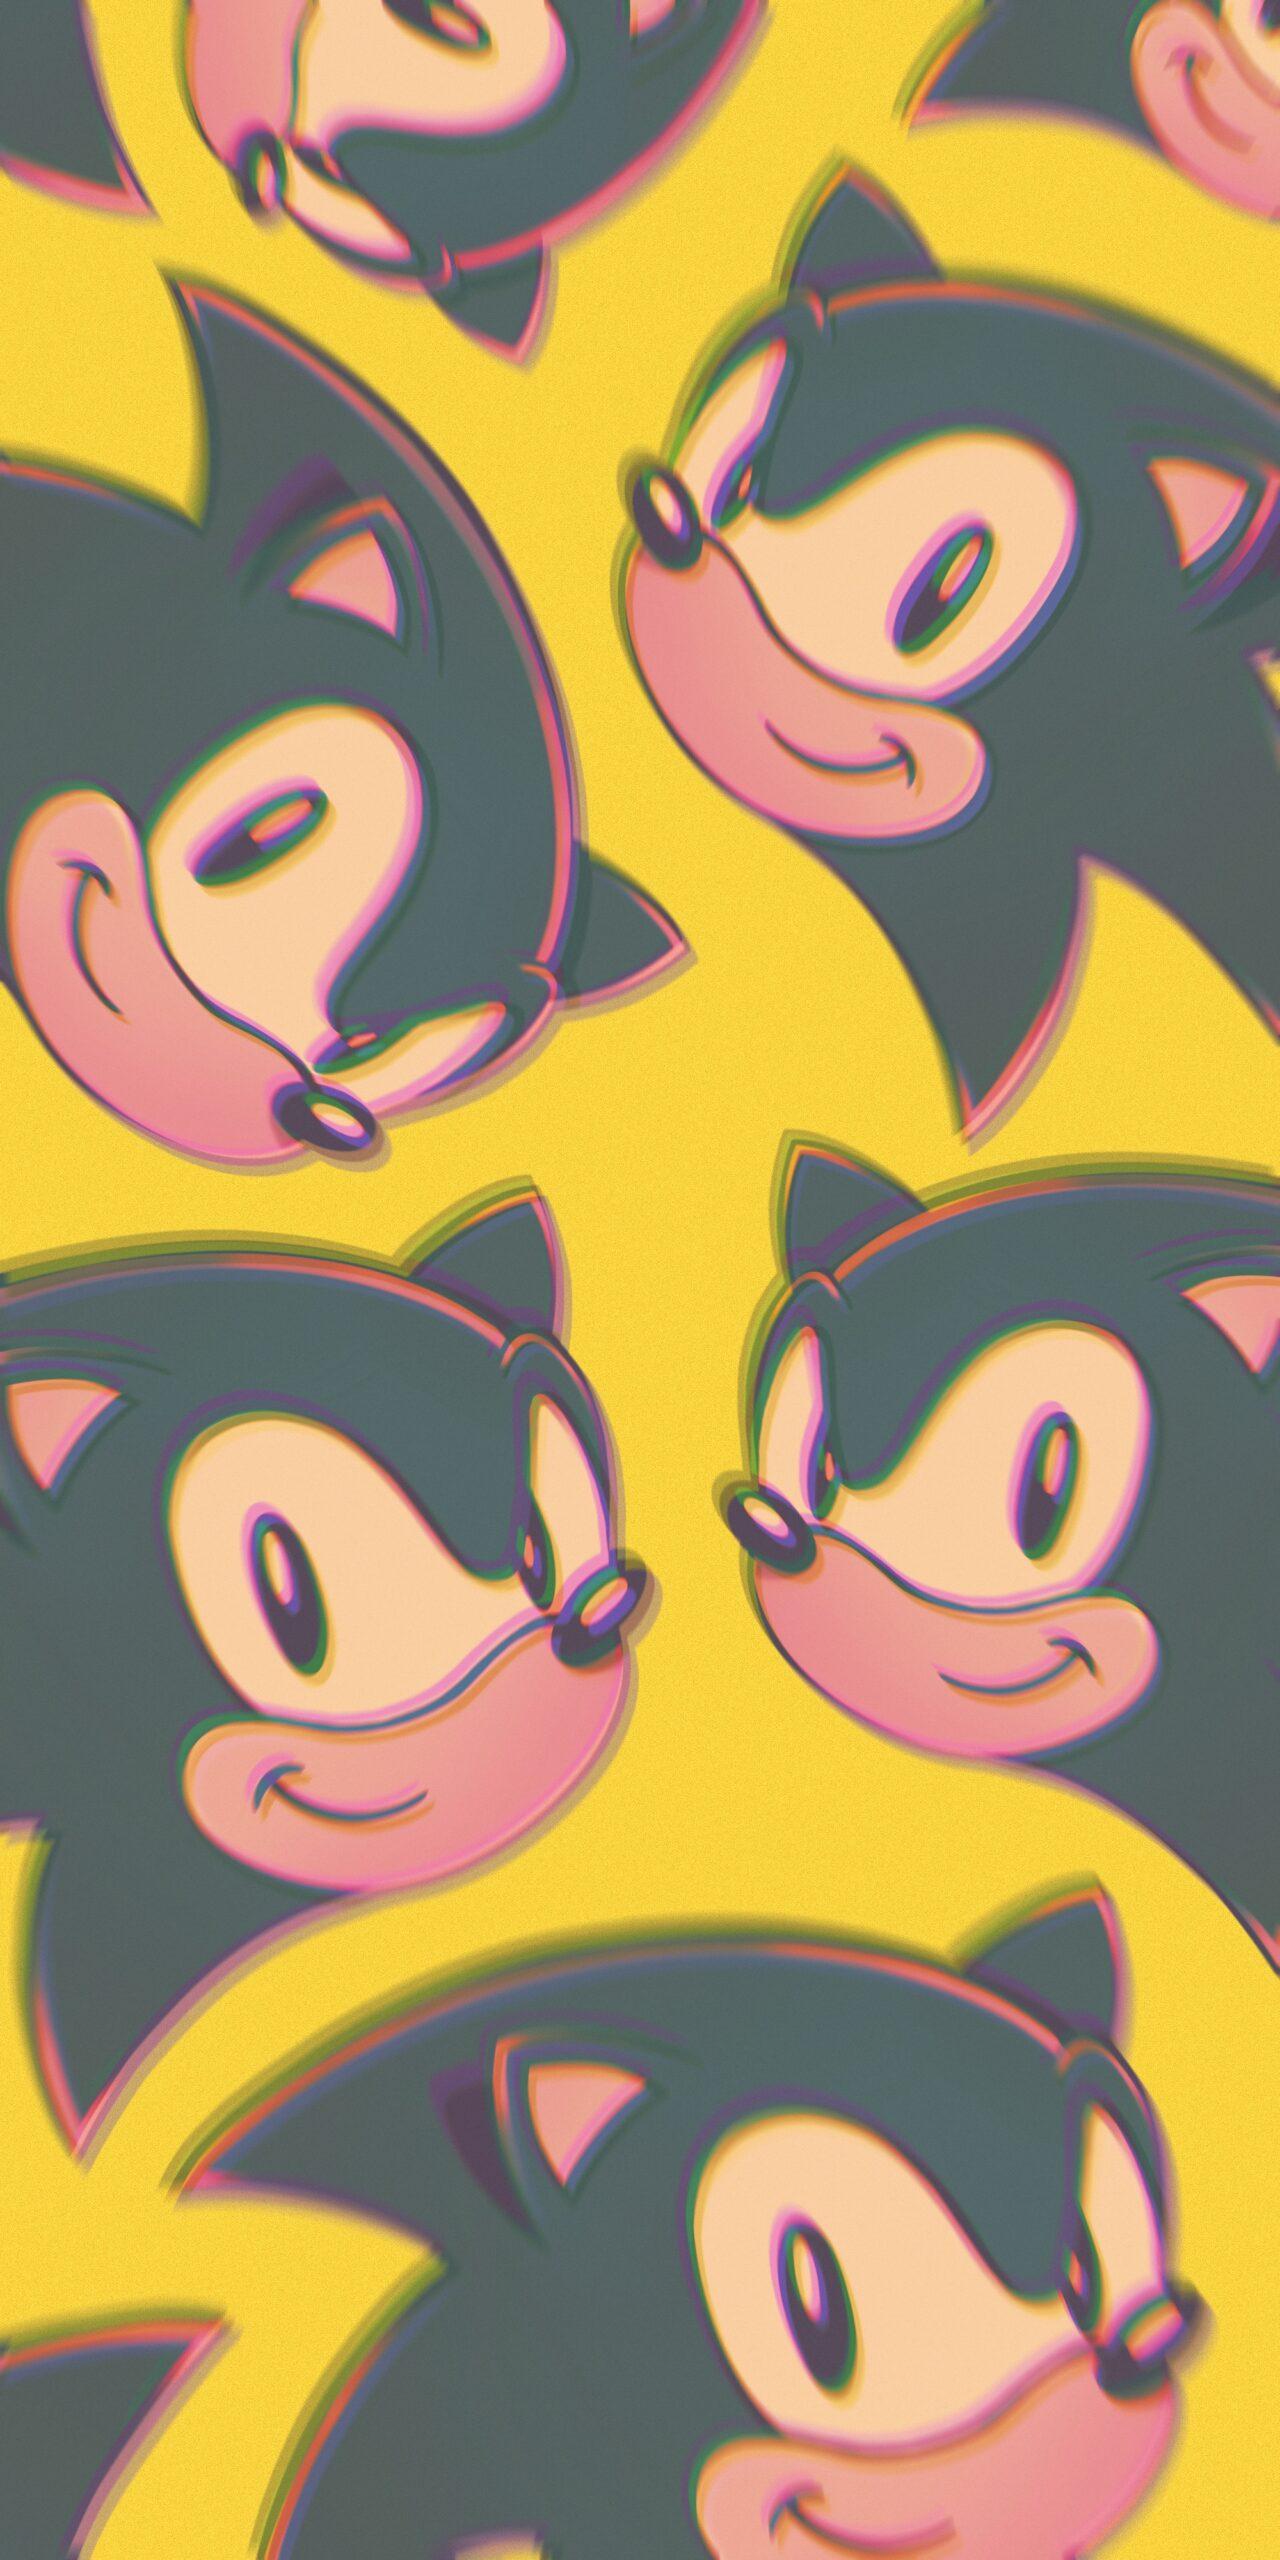 sonic yellow background wallpaper